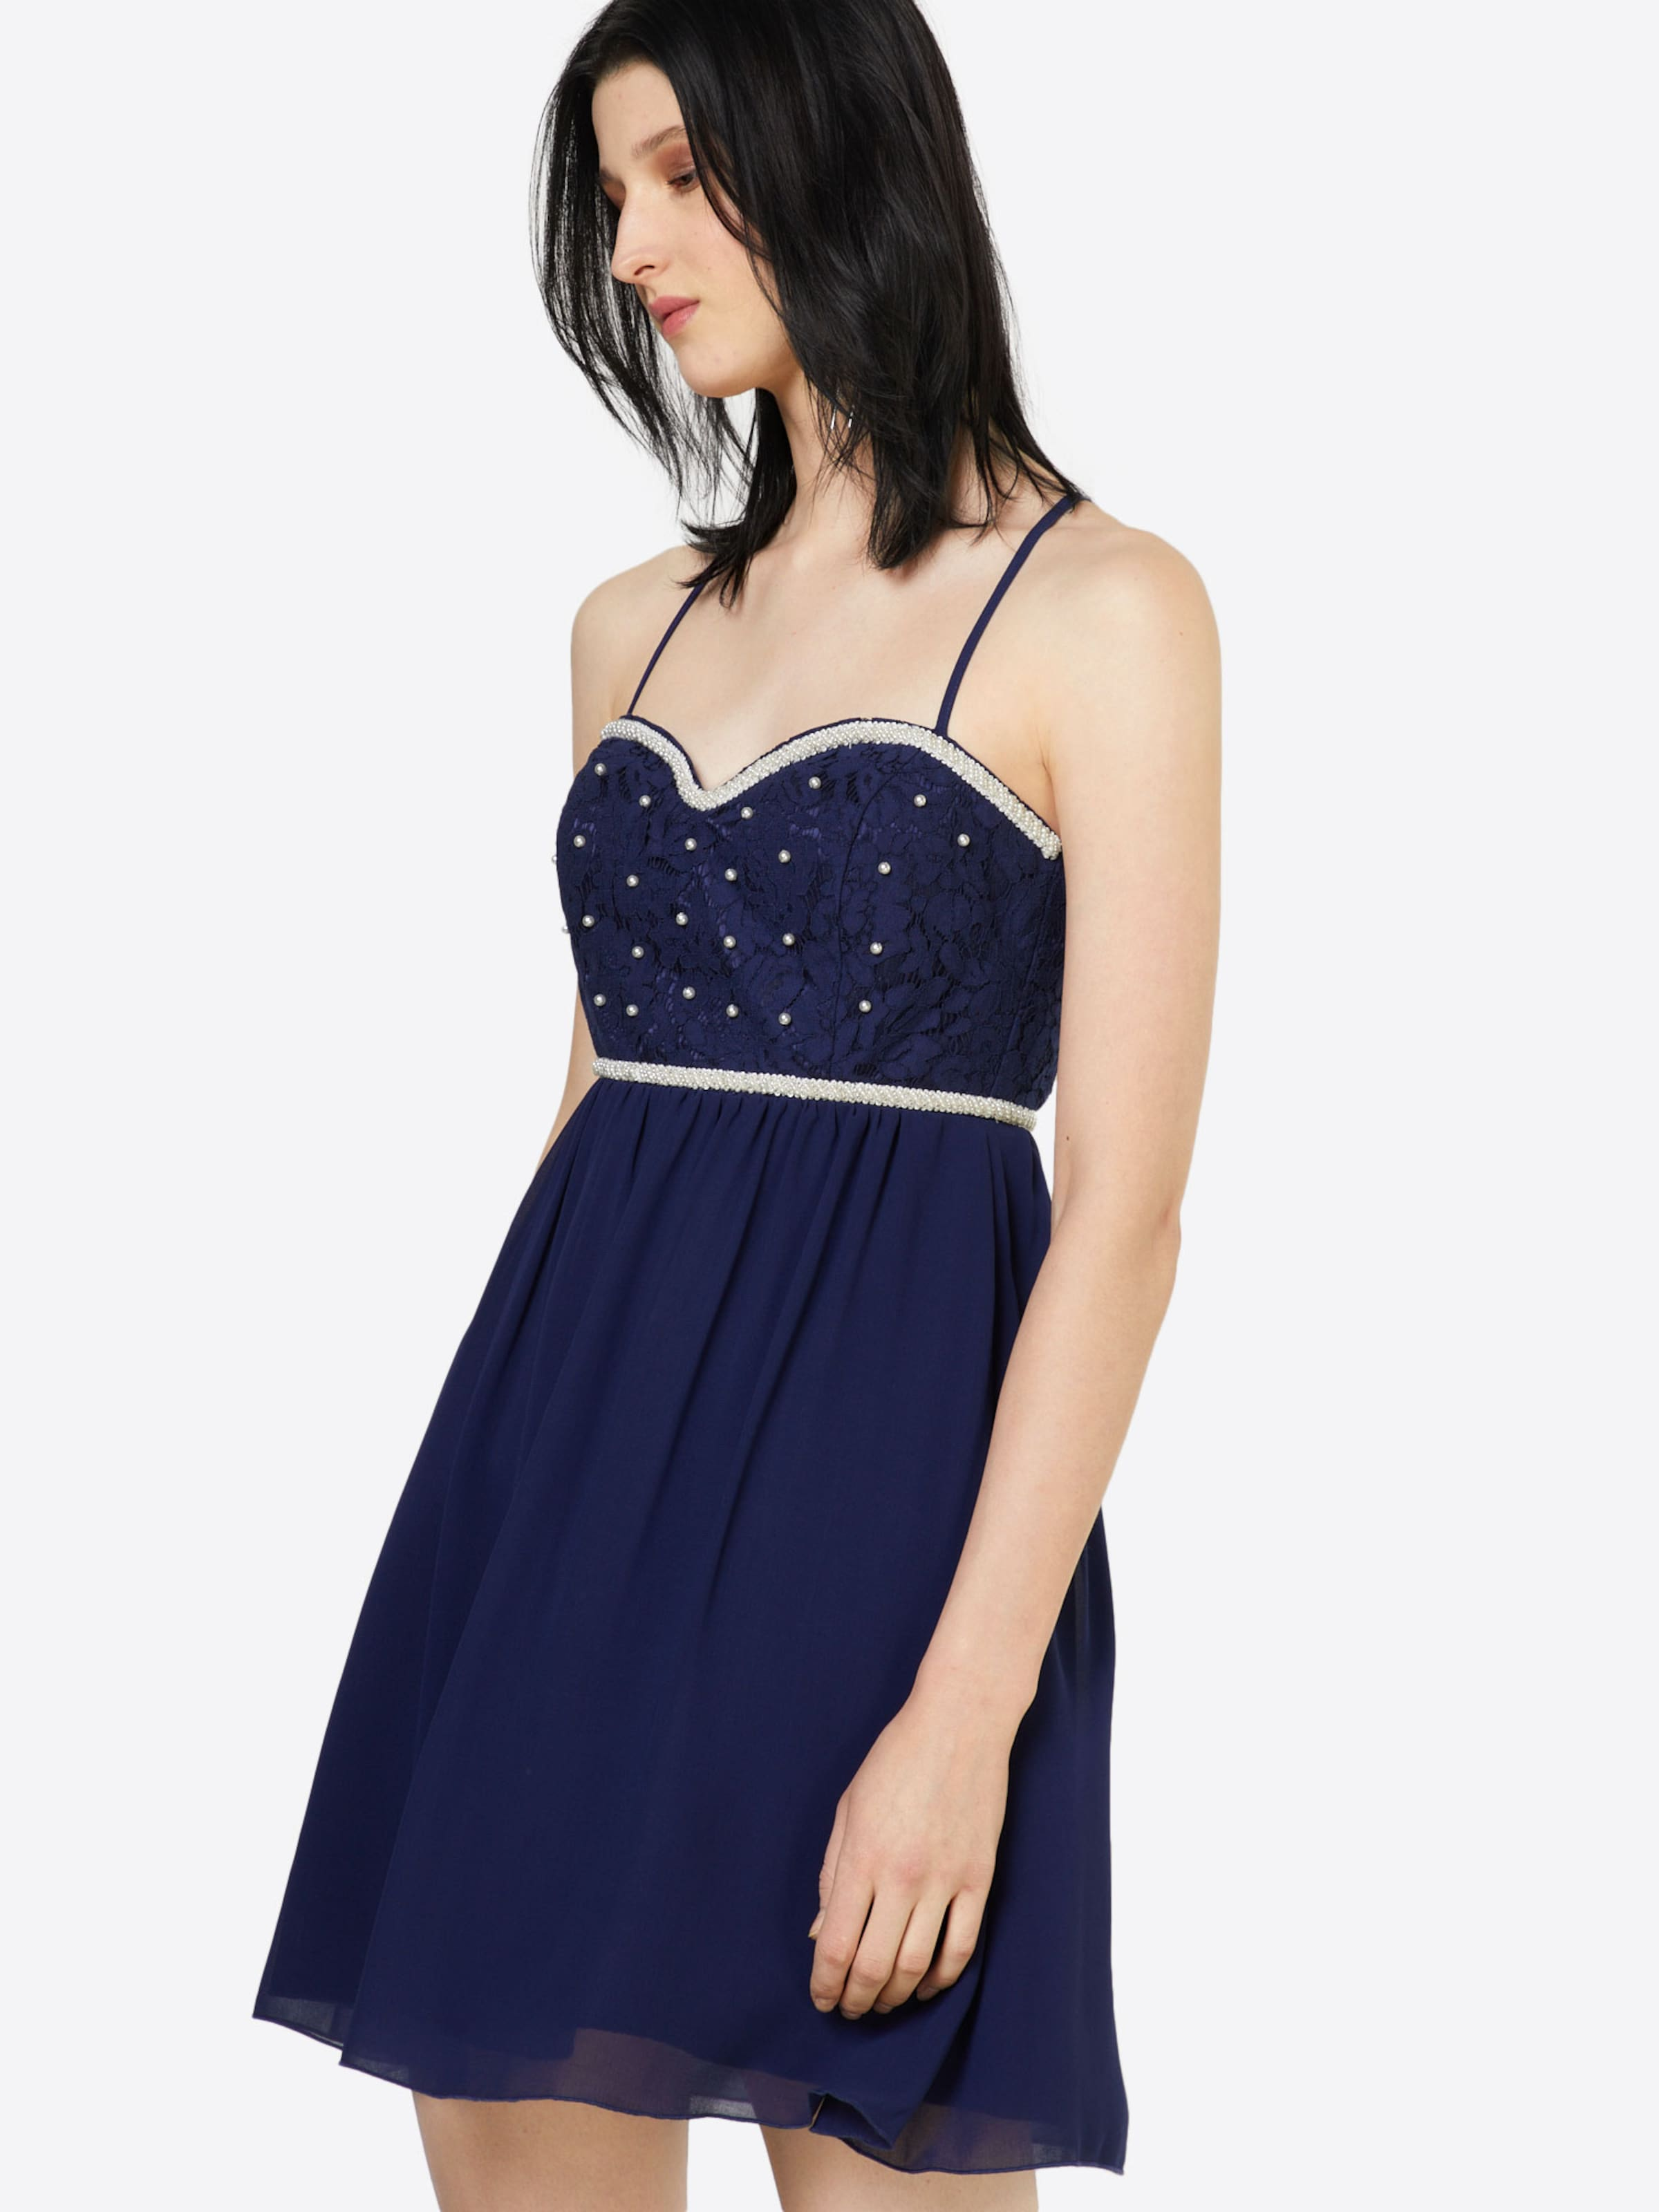 En Bleu Princess Clair Suddenly Robe 54ARqL3j